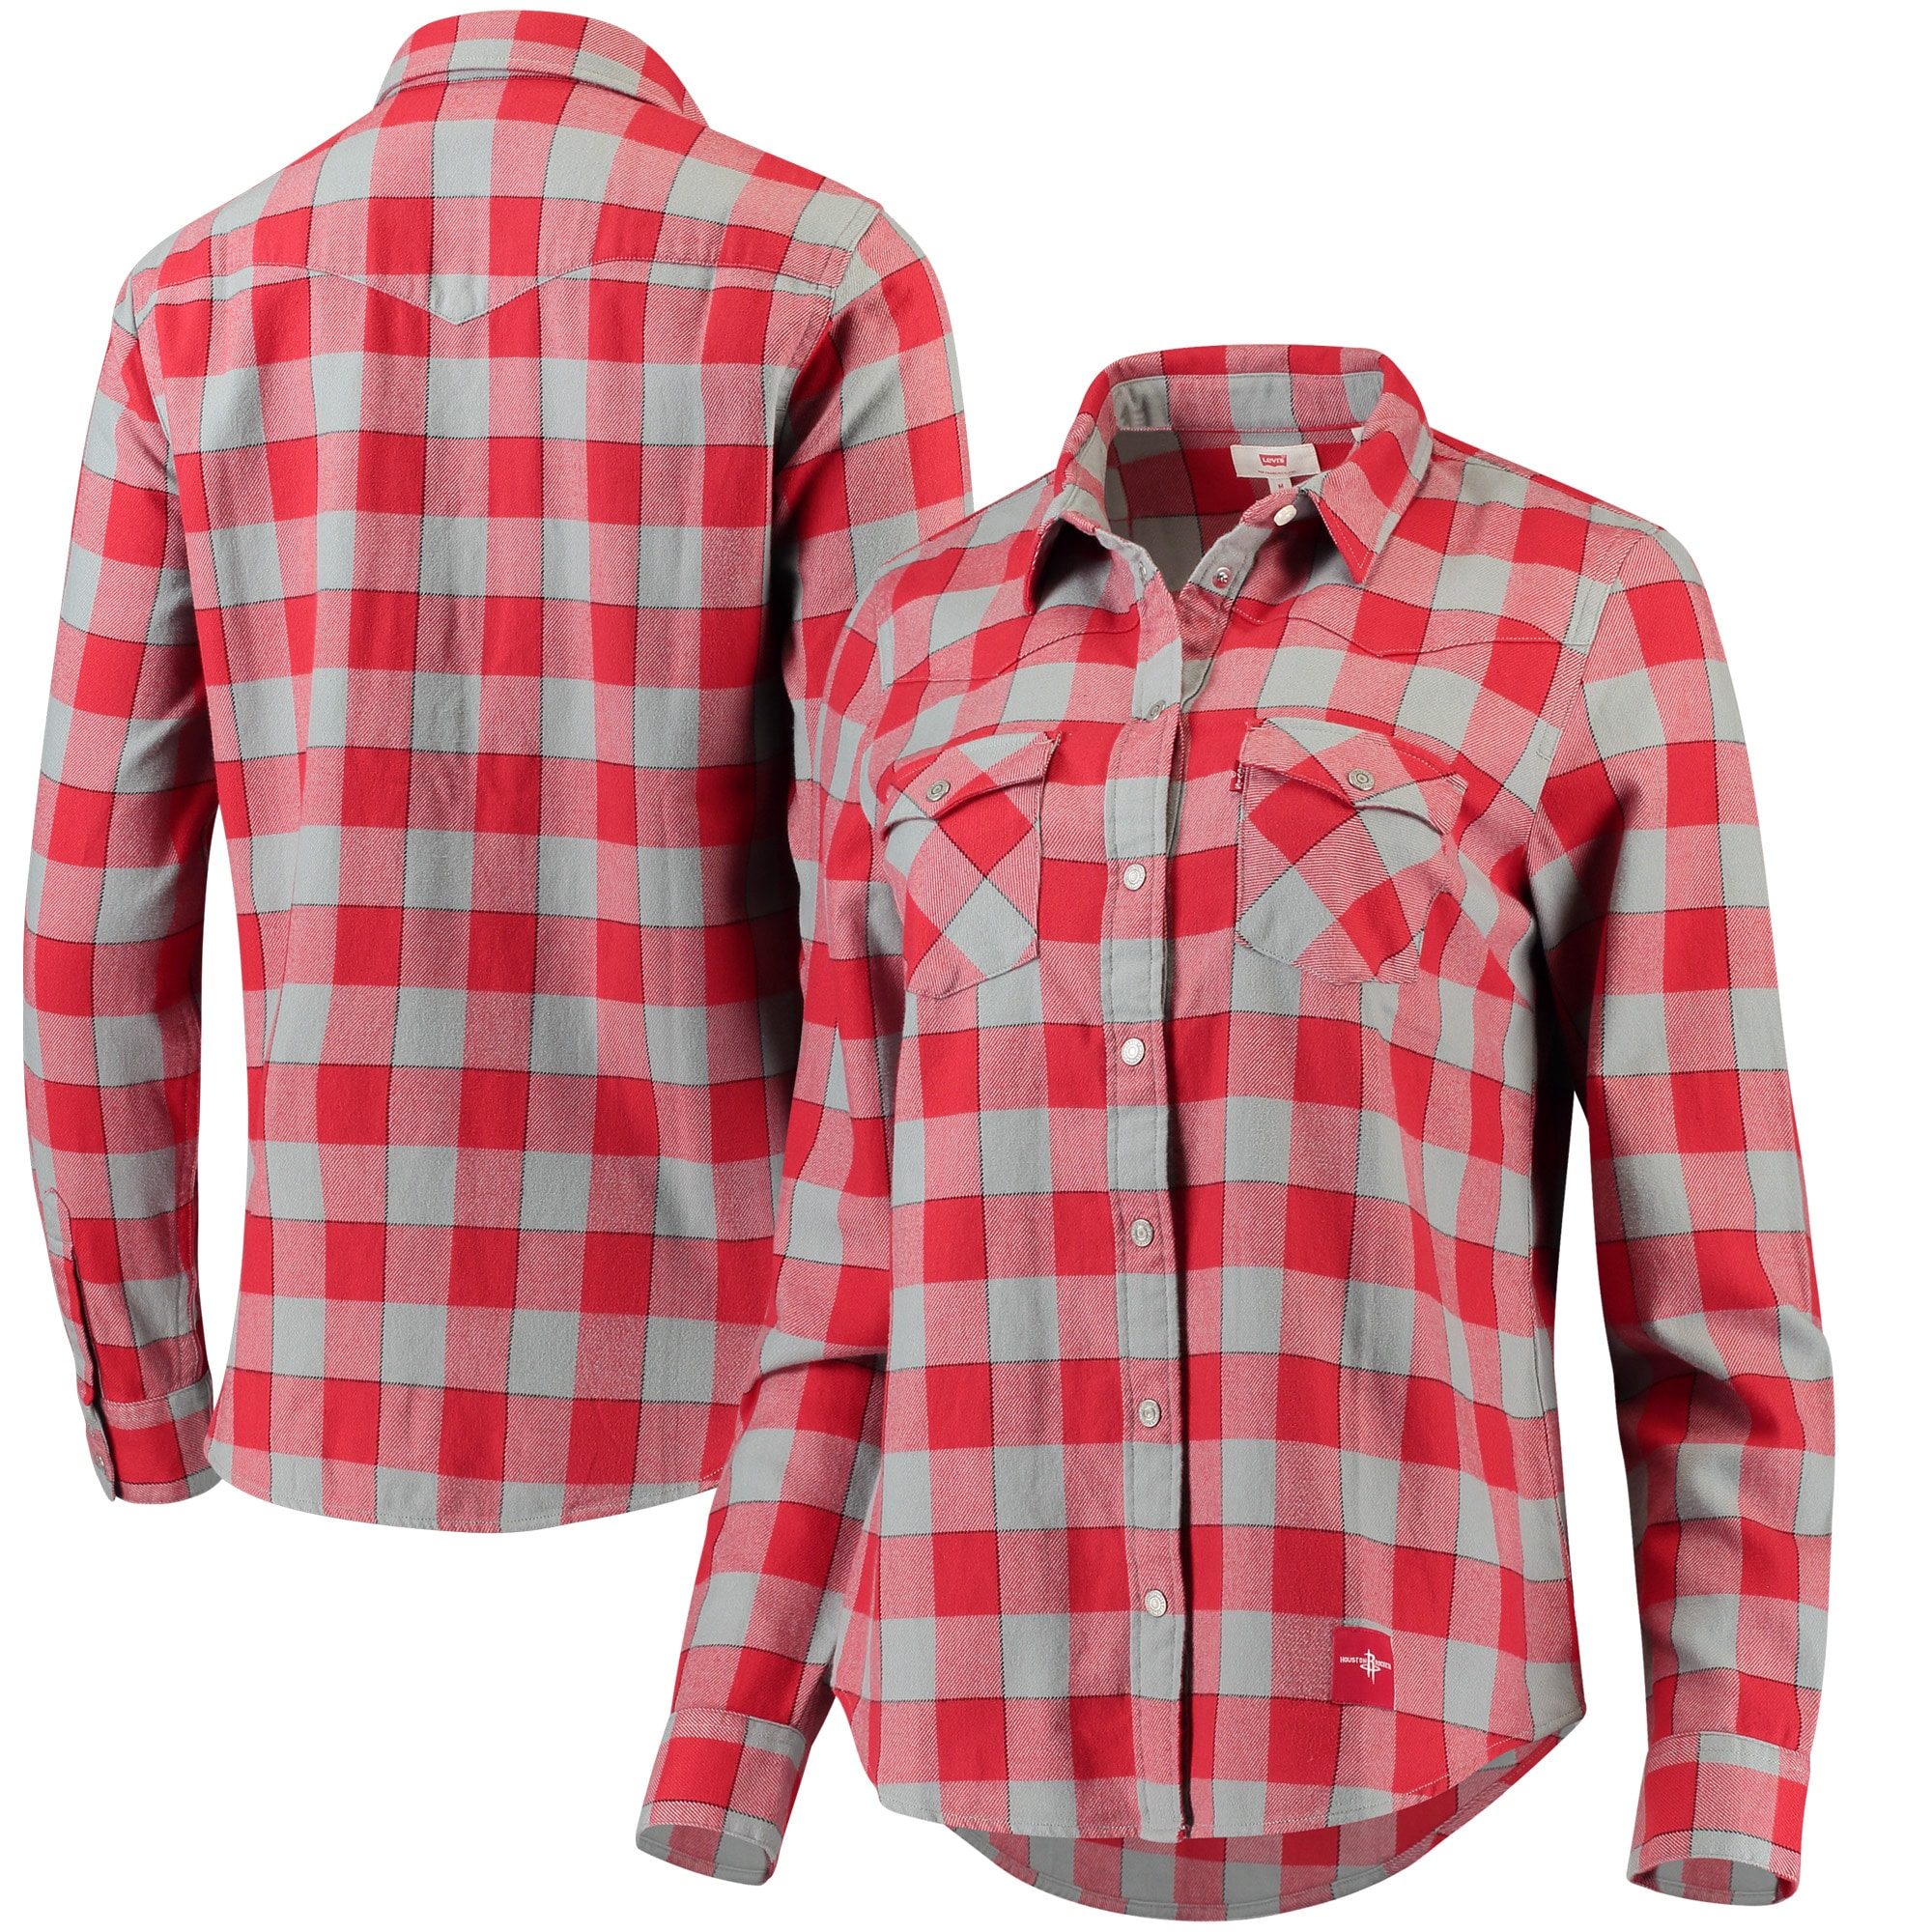 Houston Rockets Levi's Women's Buffalo Western Long Sleeve Button-Up Shirt - Red/White